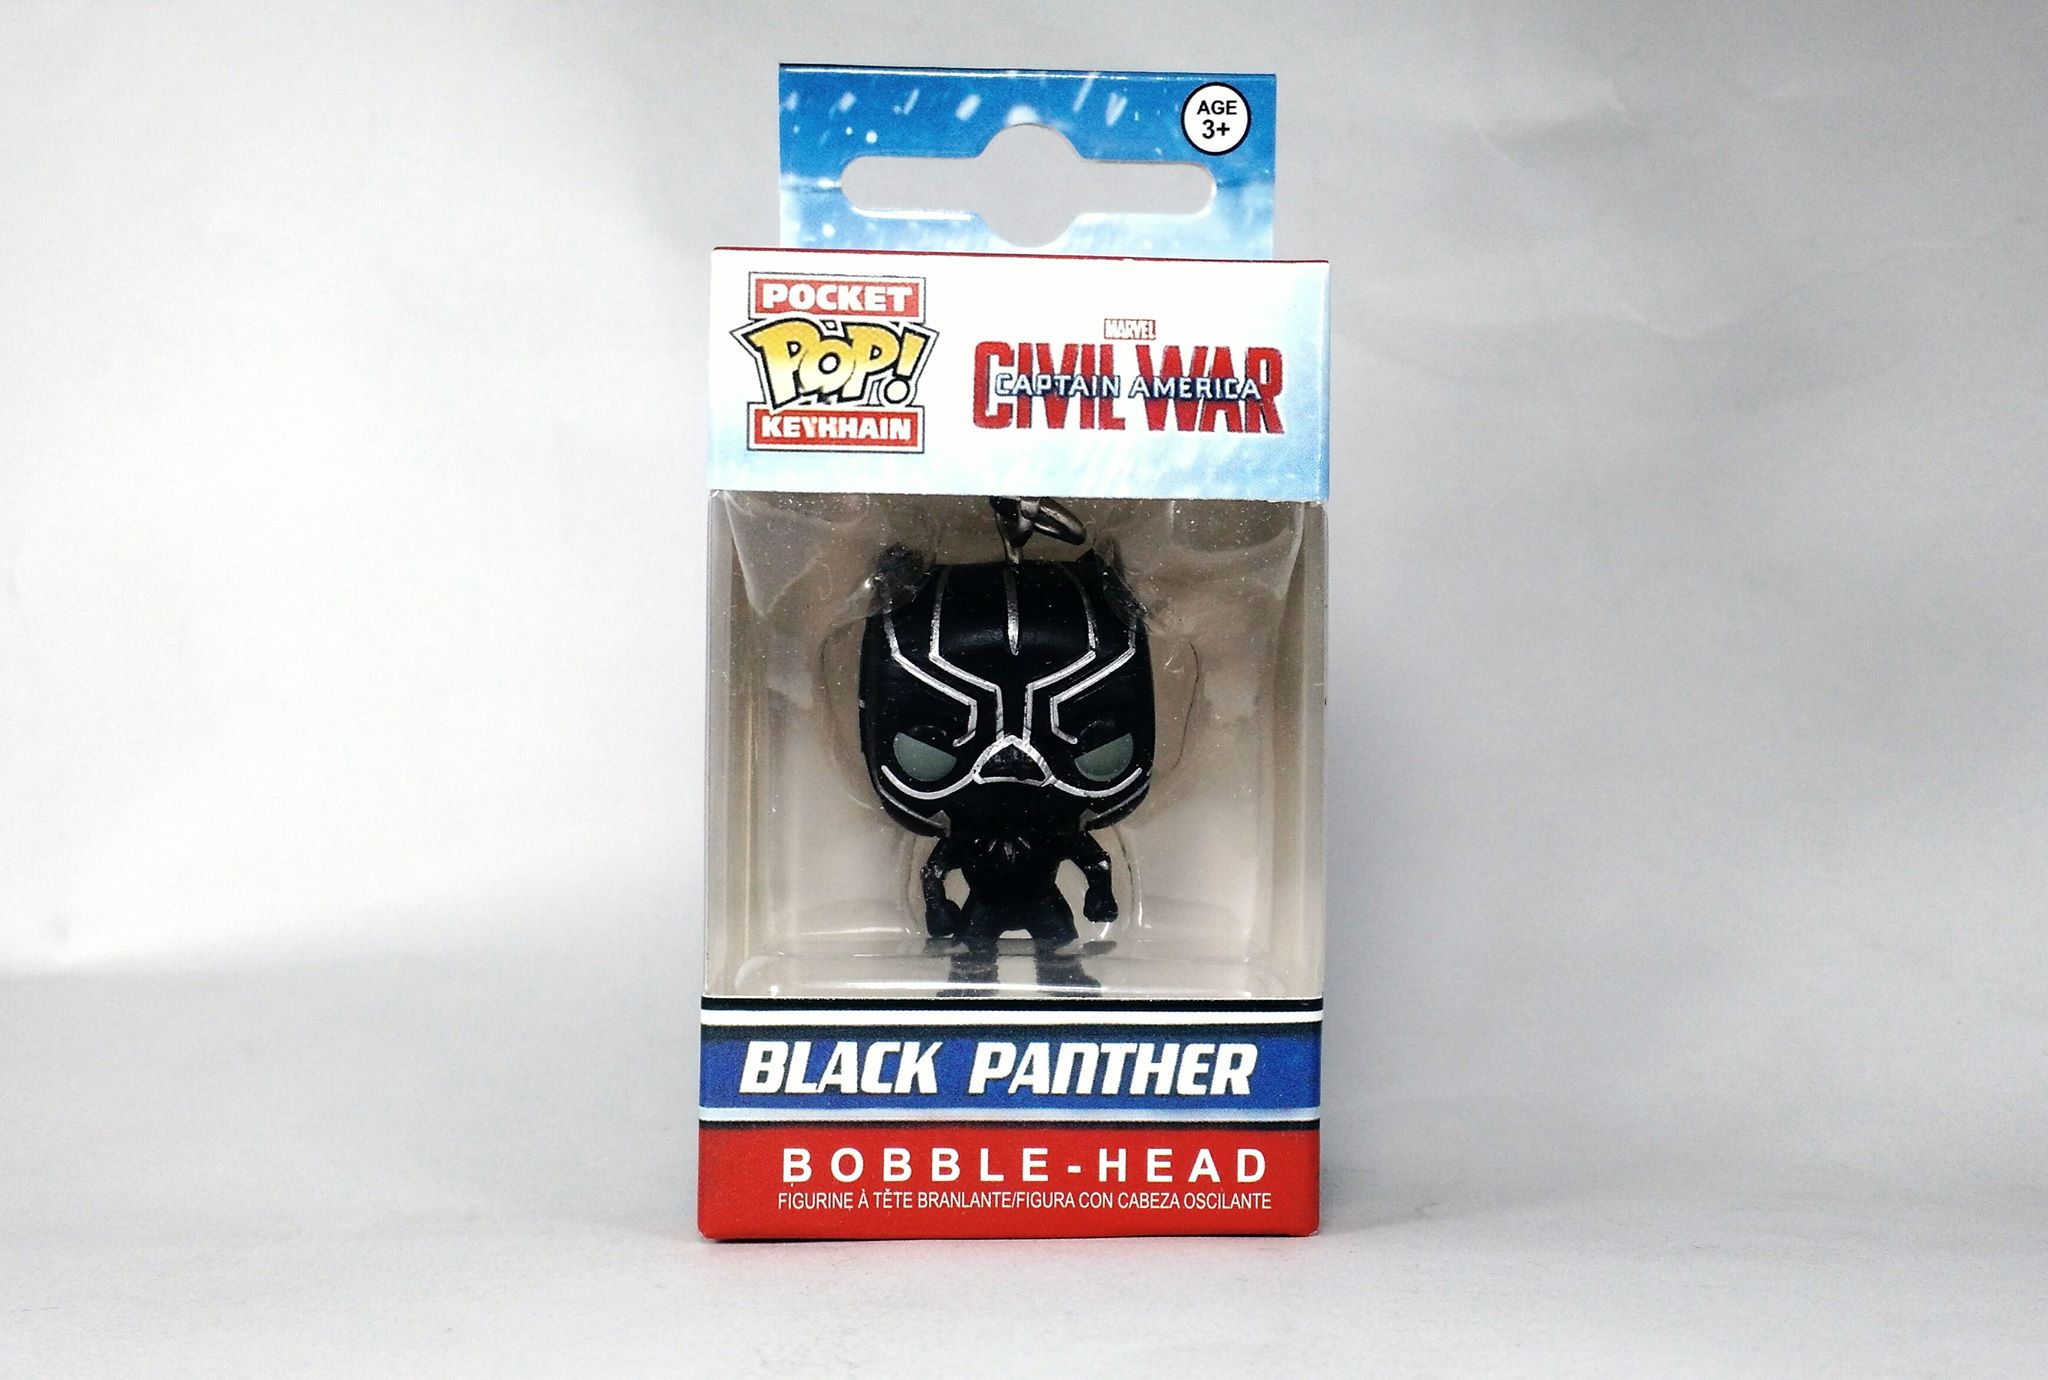 Black Partner